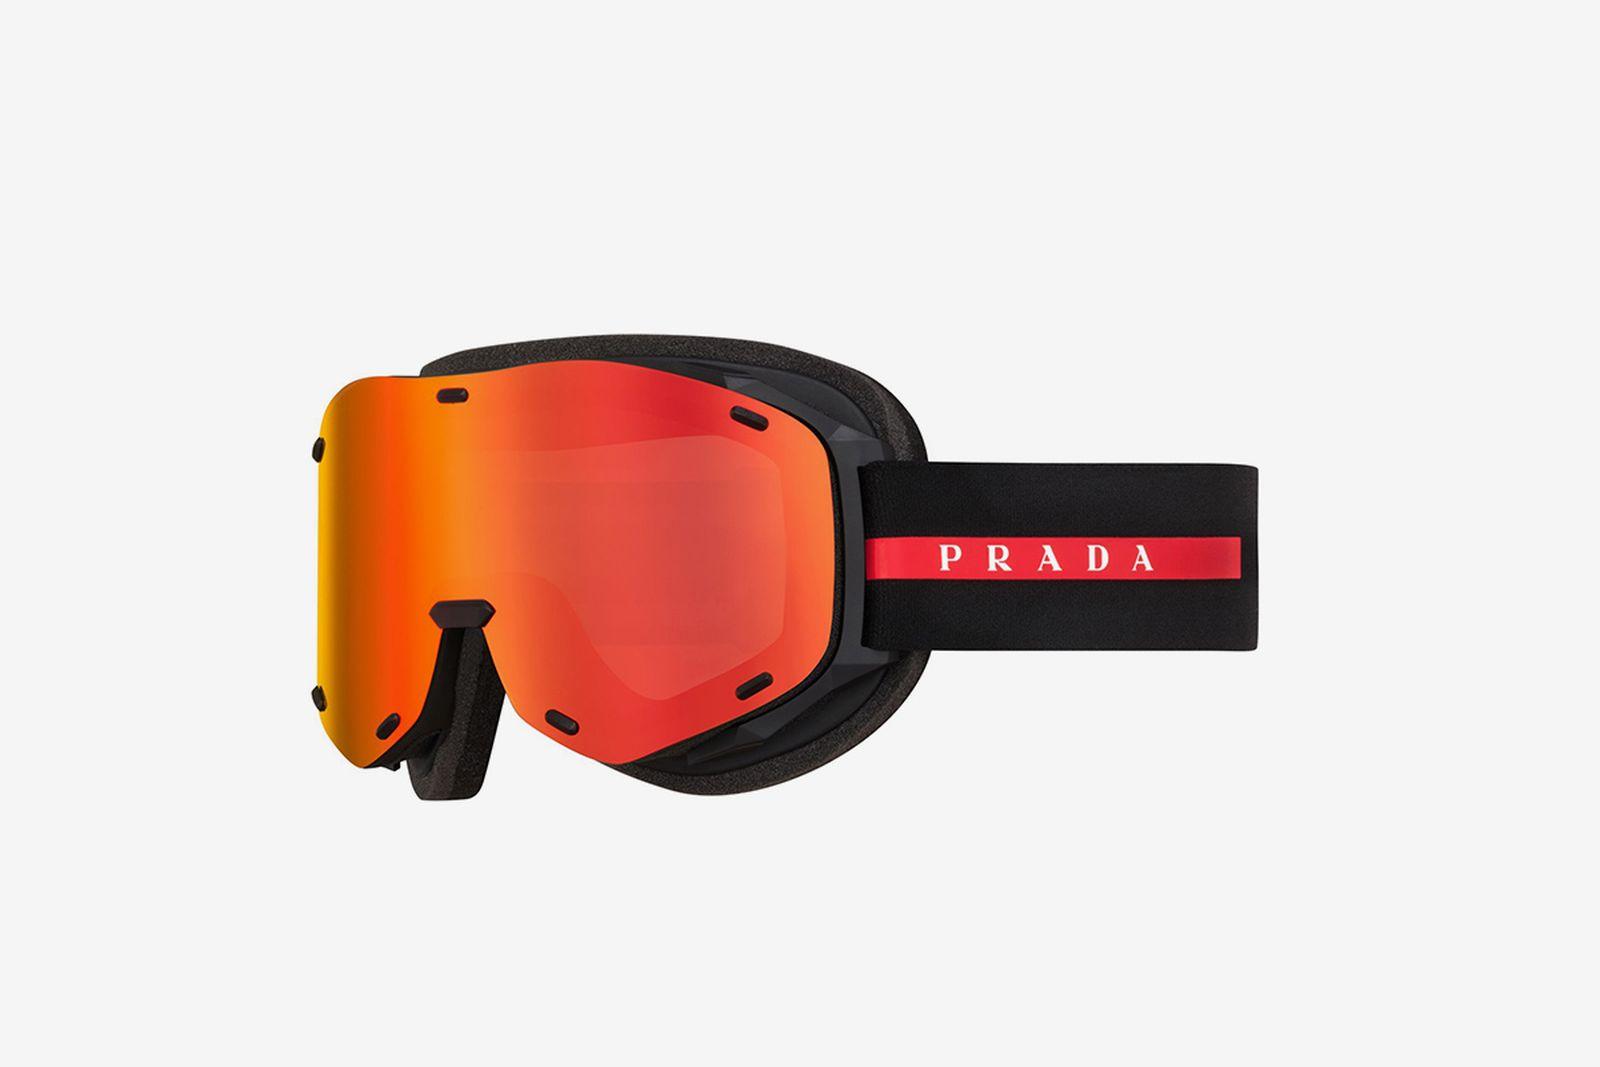 Prada Linea Rossa Ski Googles